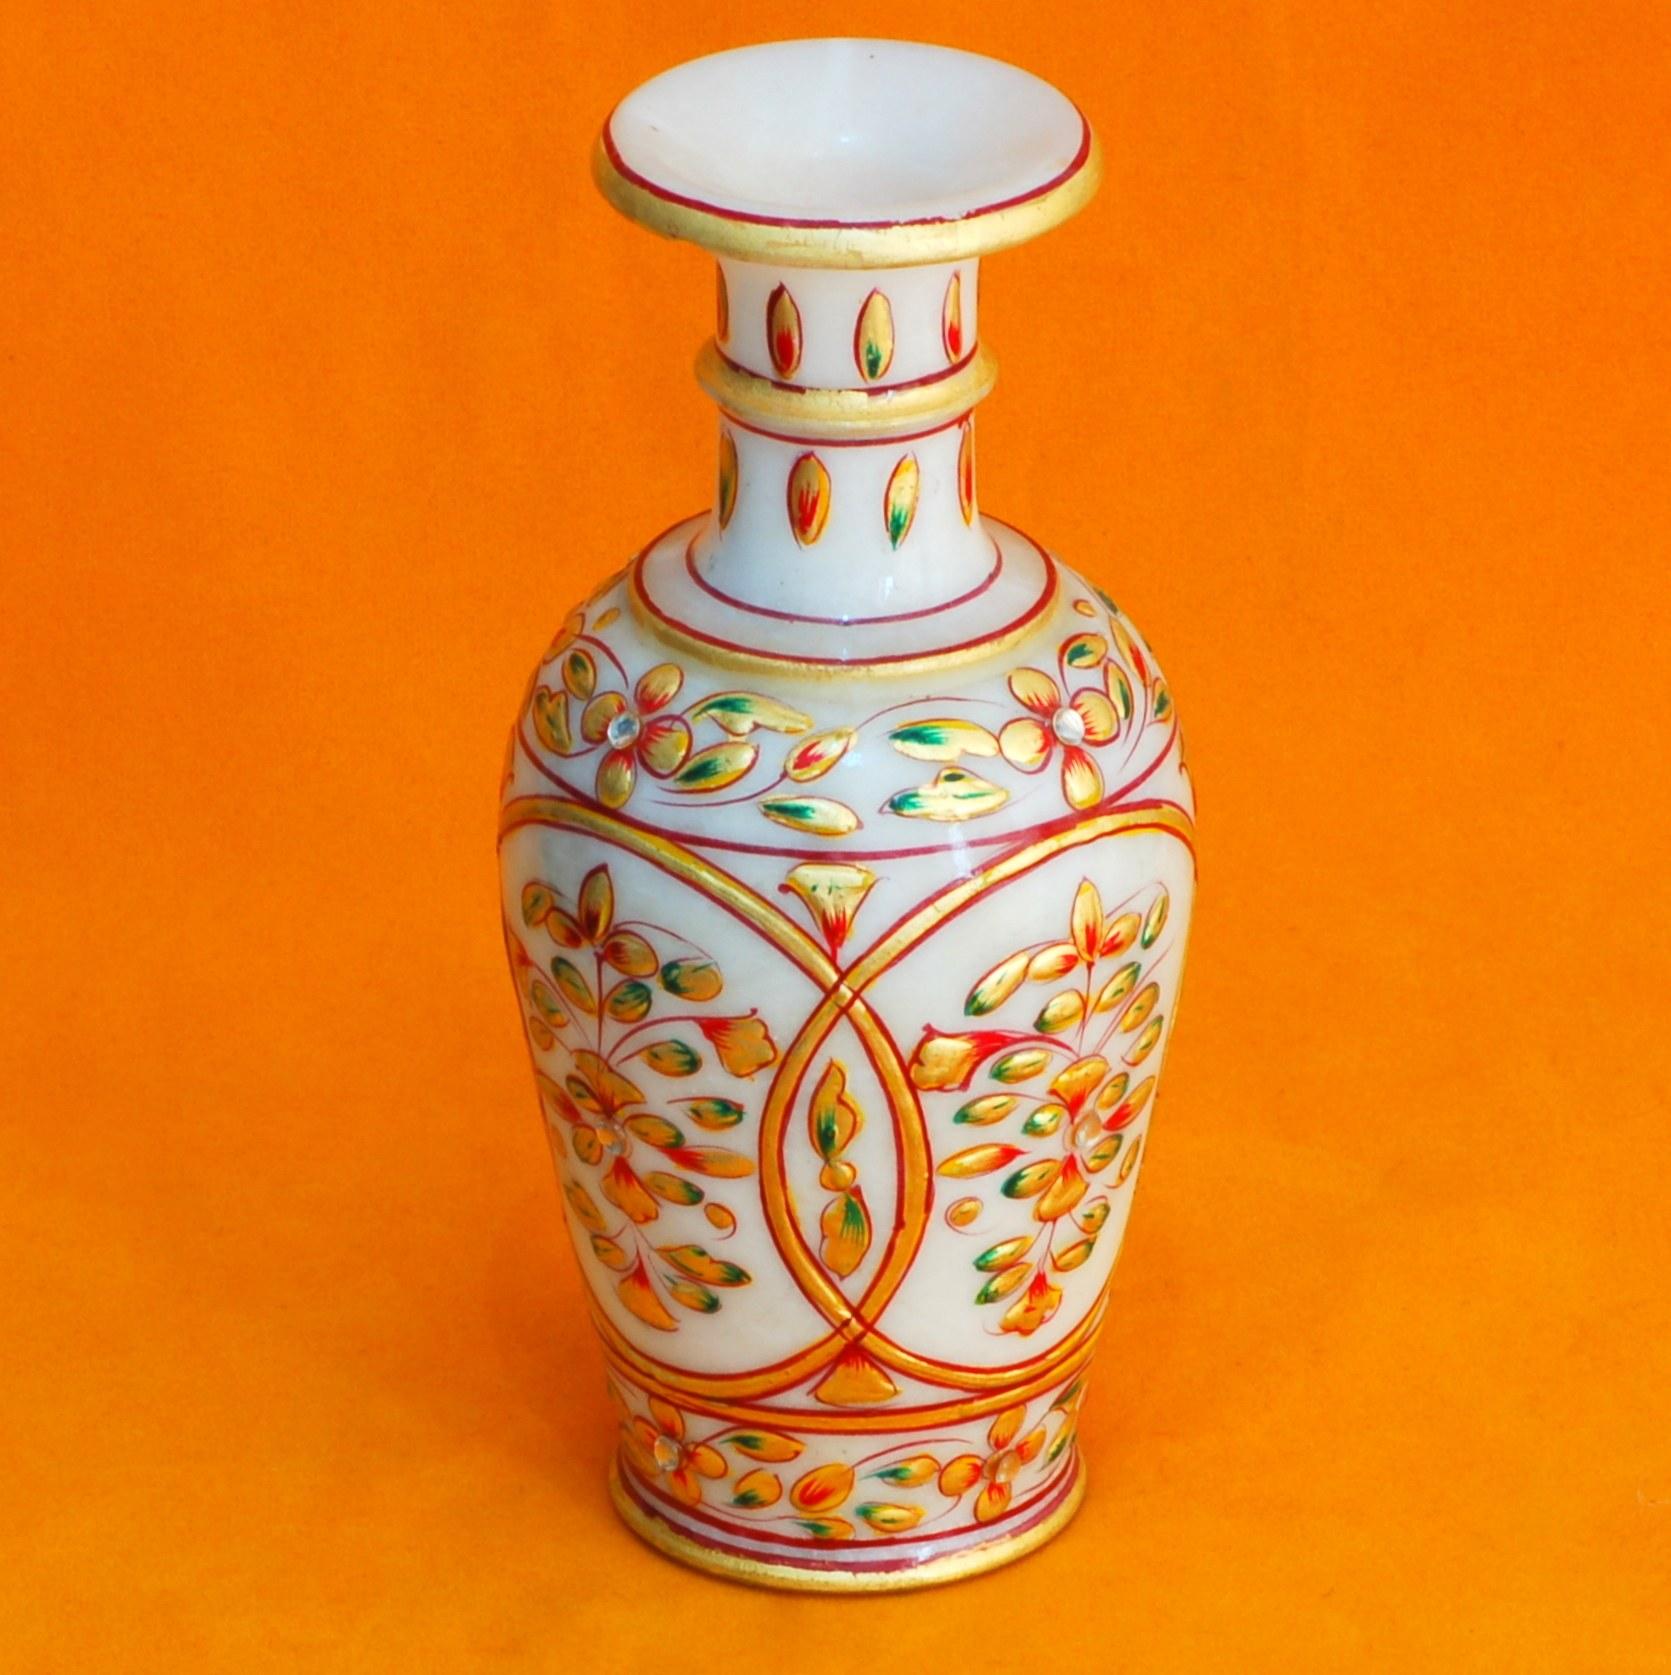 flower vase designs - Flower Vase